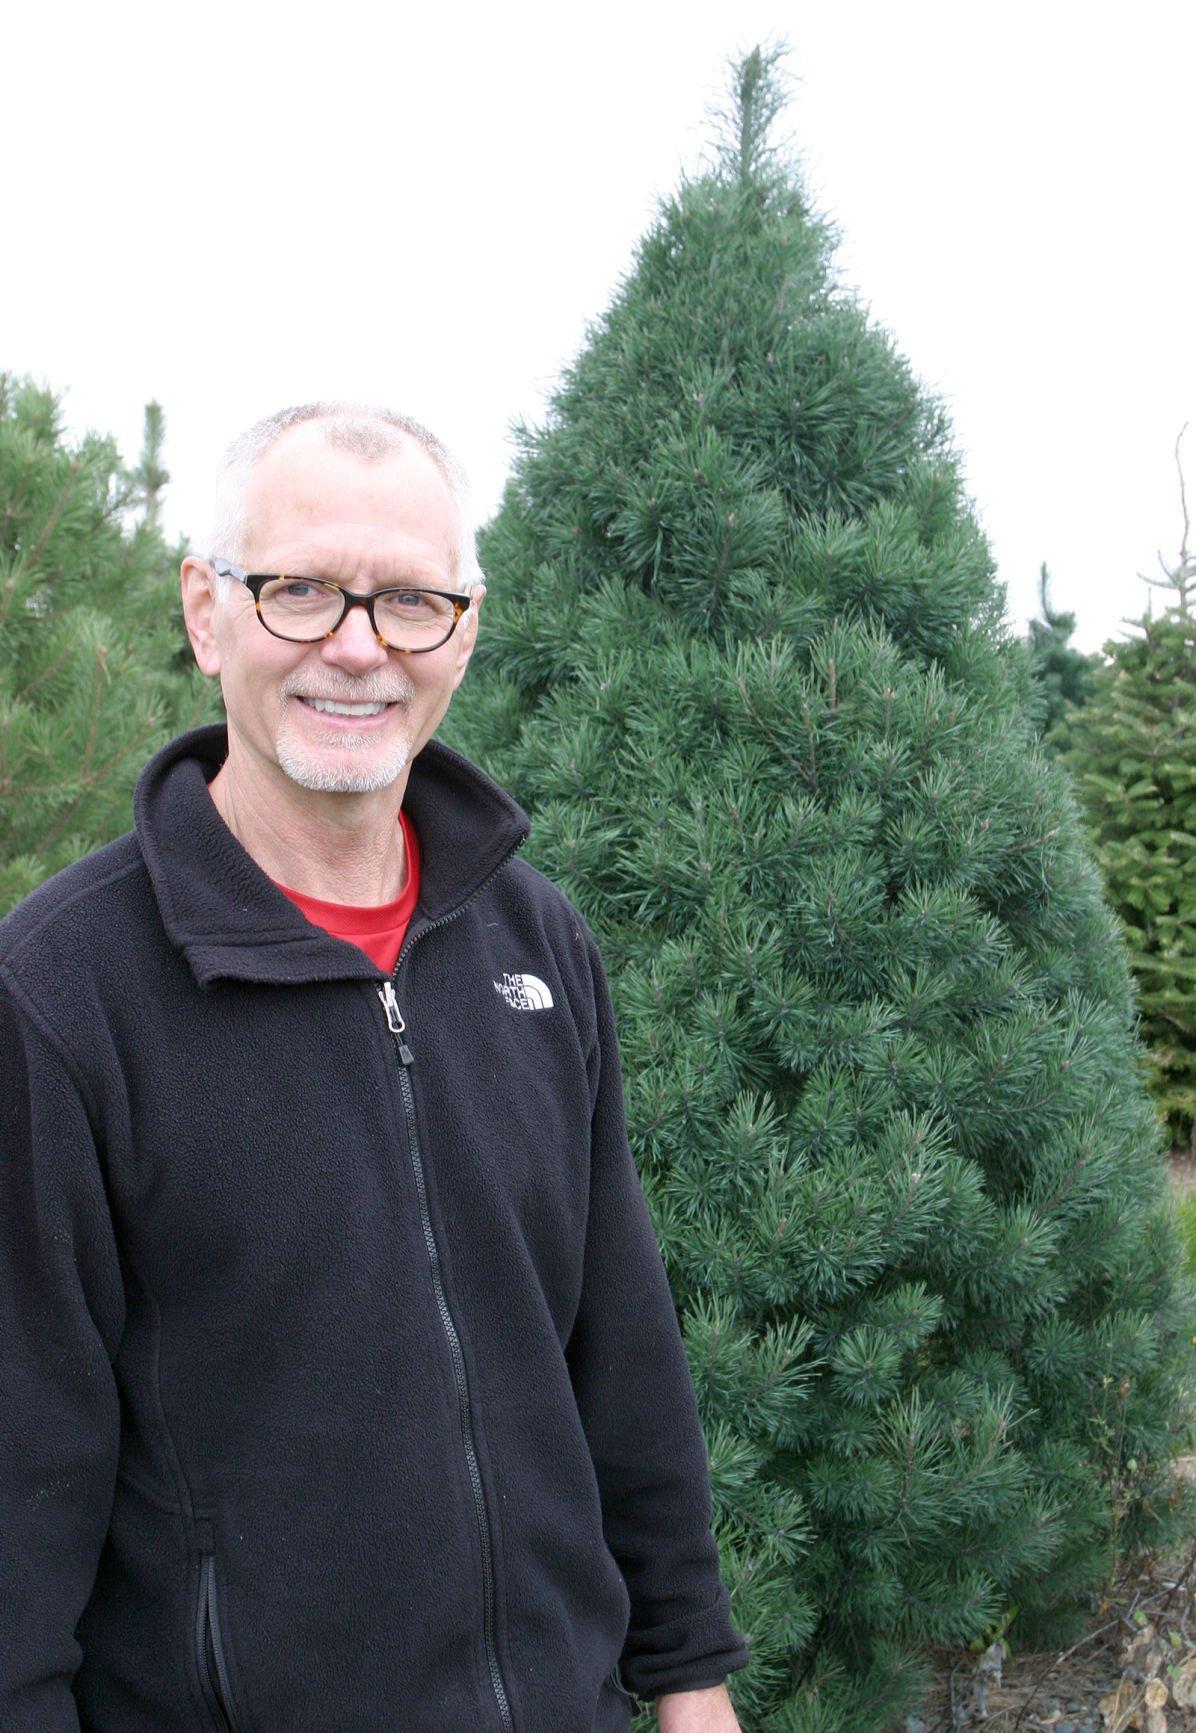 Krueger with tree - vertical